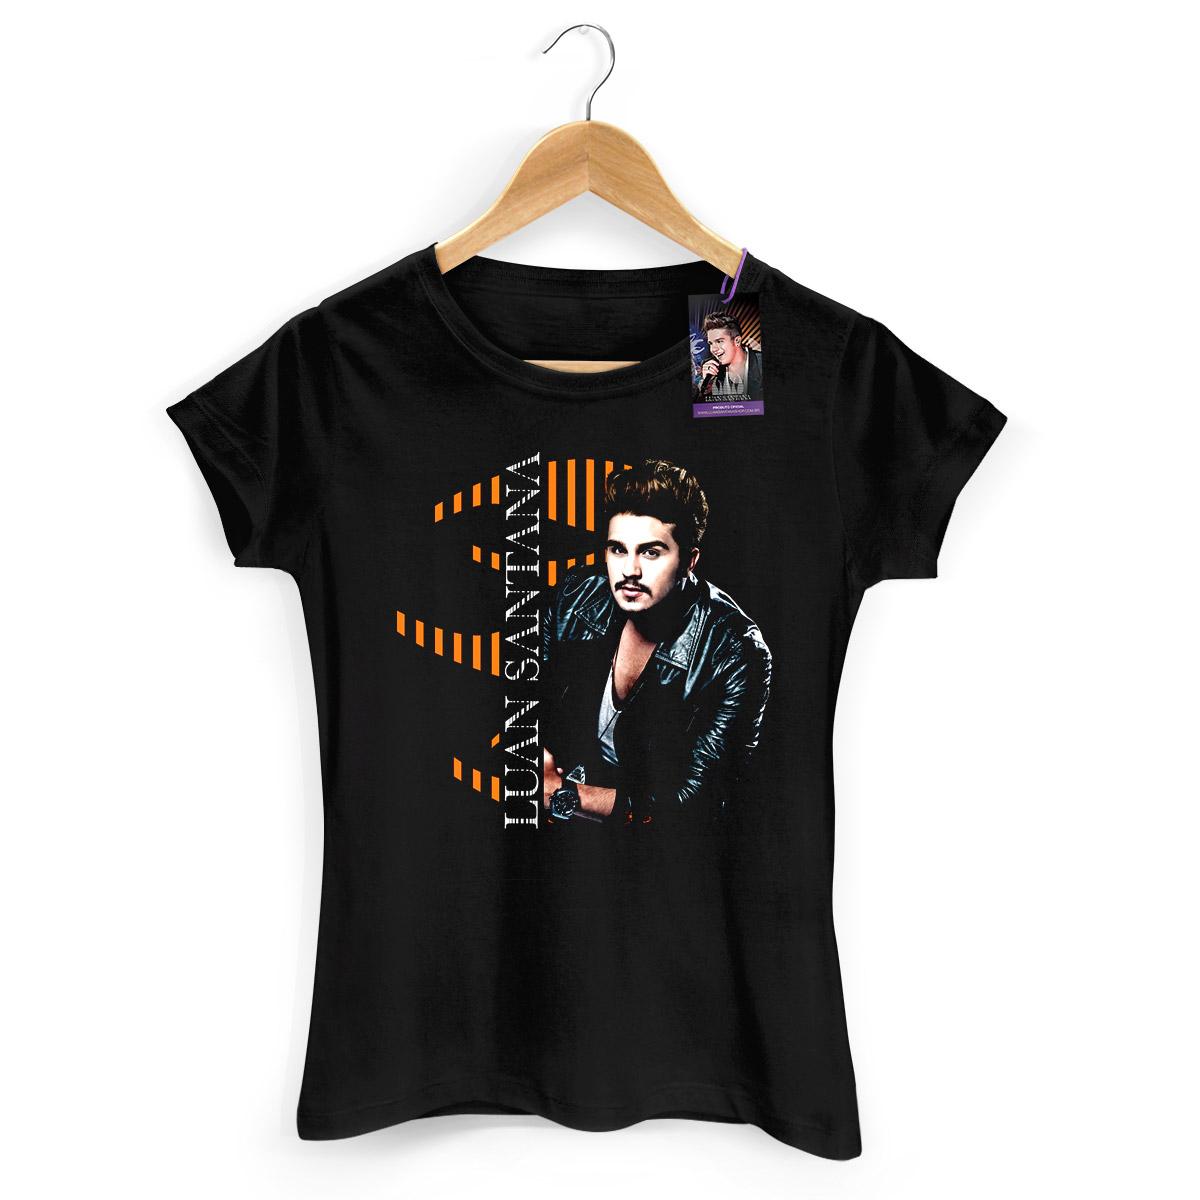 Camiseta Feminina Luan Santana Type